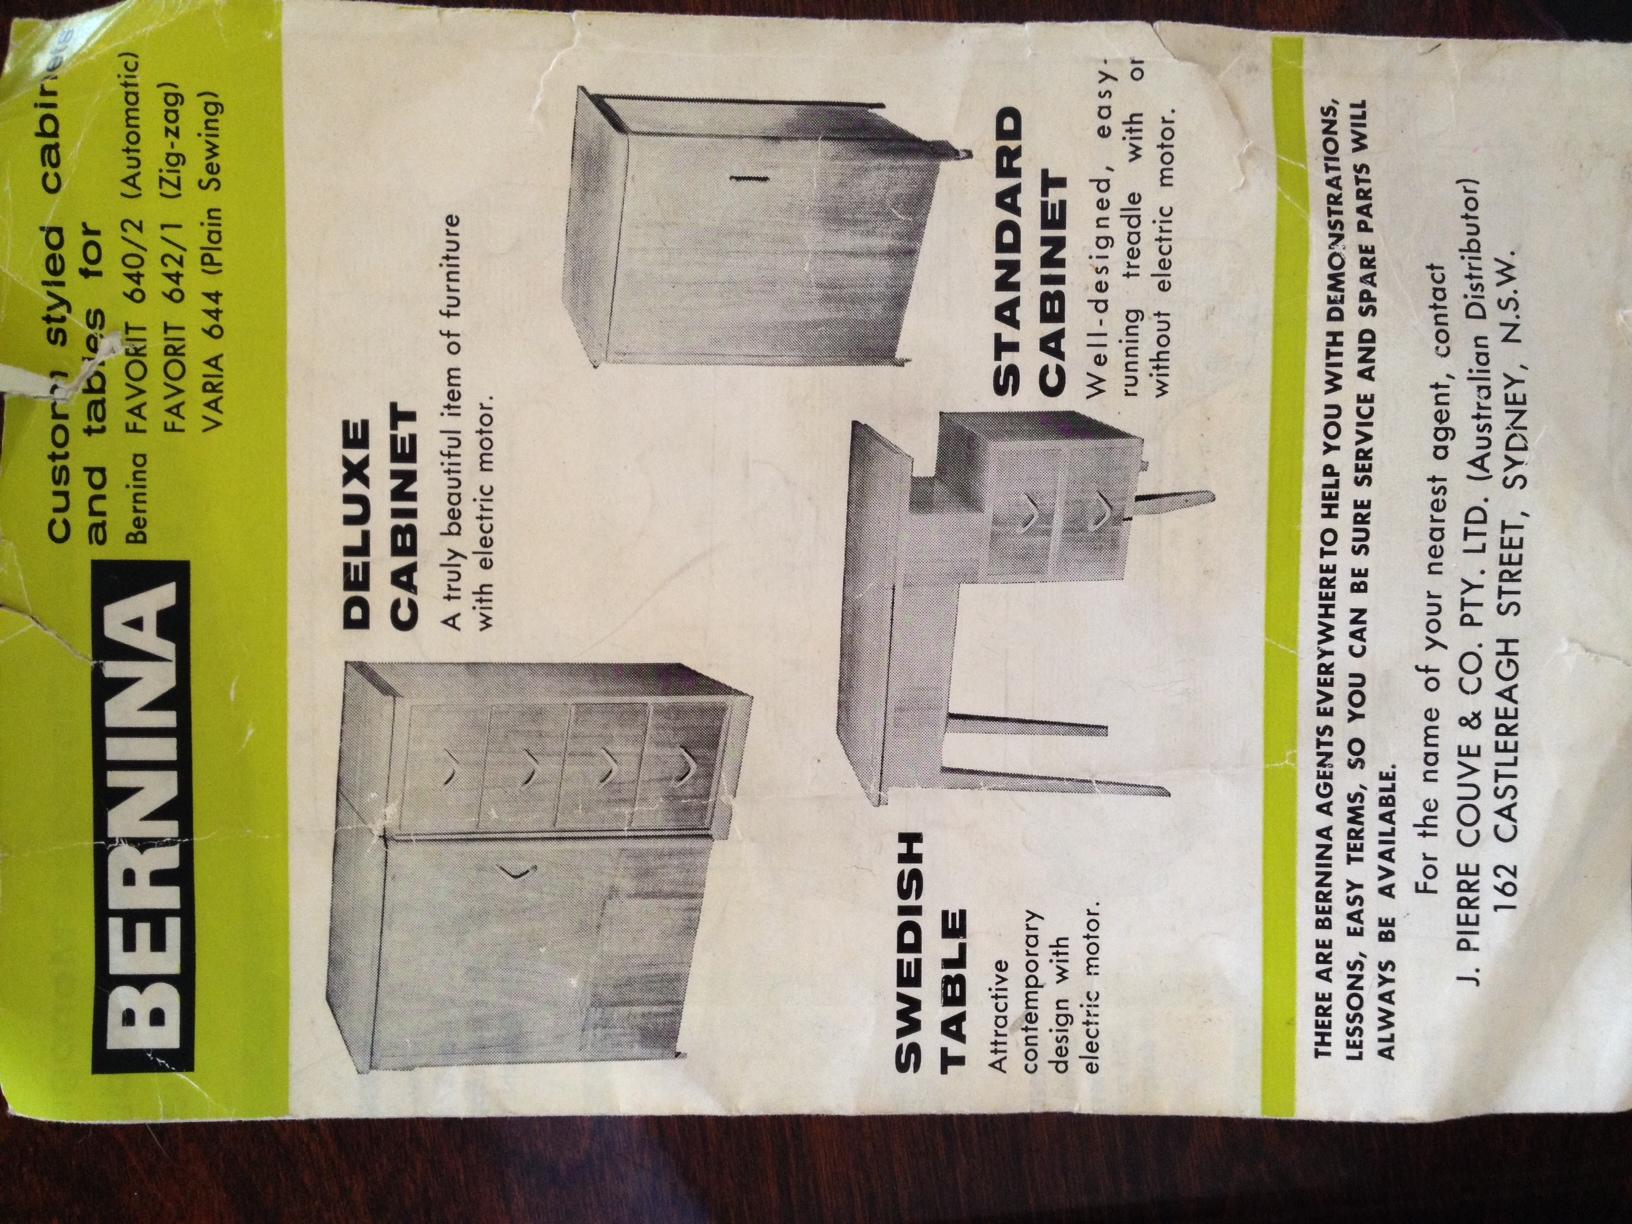 Bernina 640-2 cabinet options from original brochure